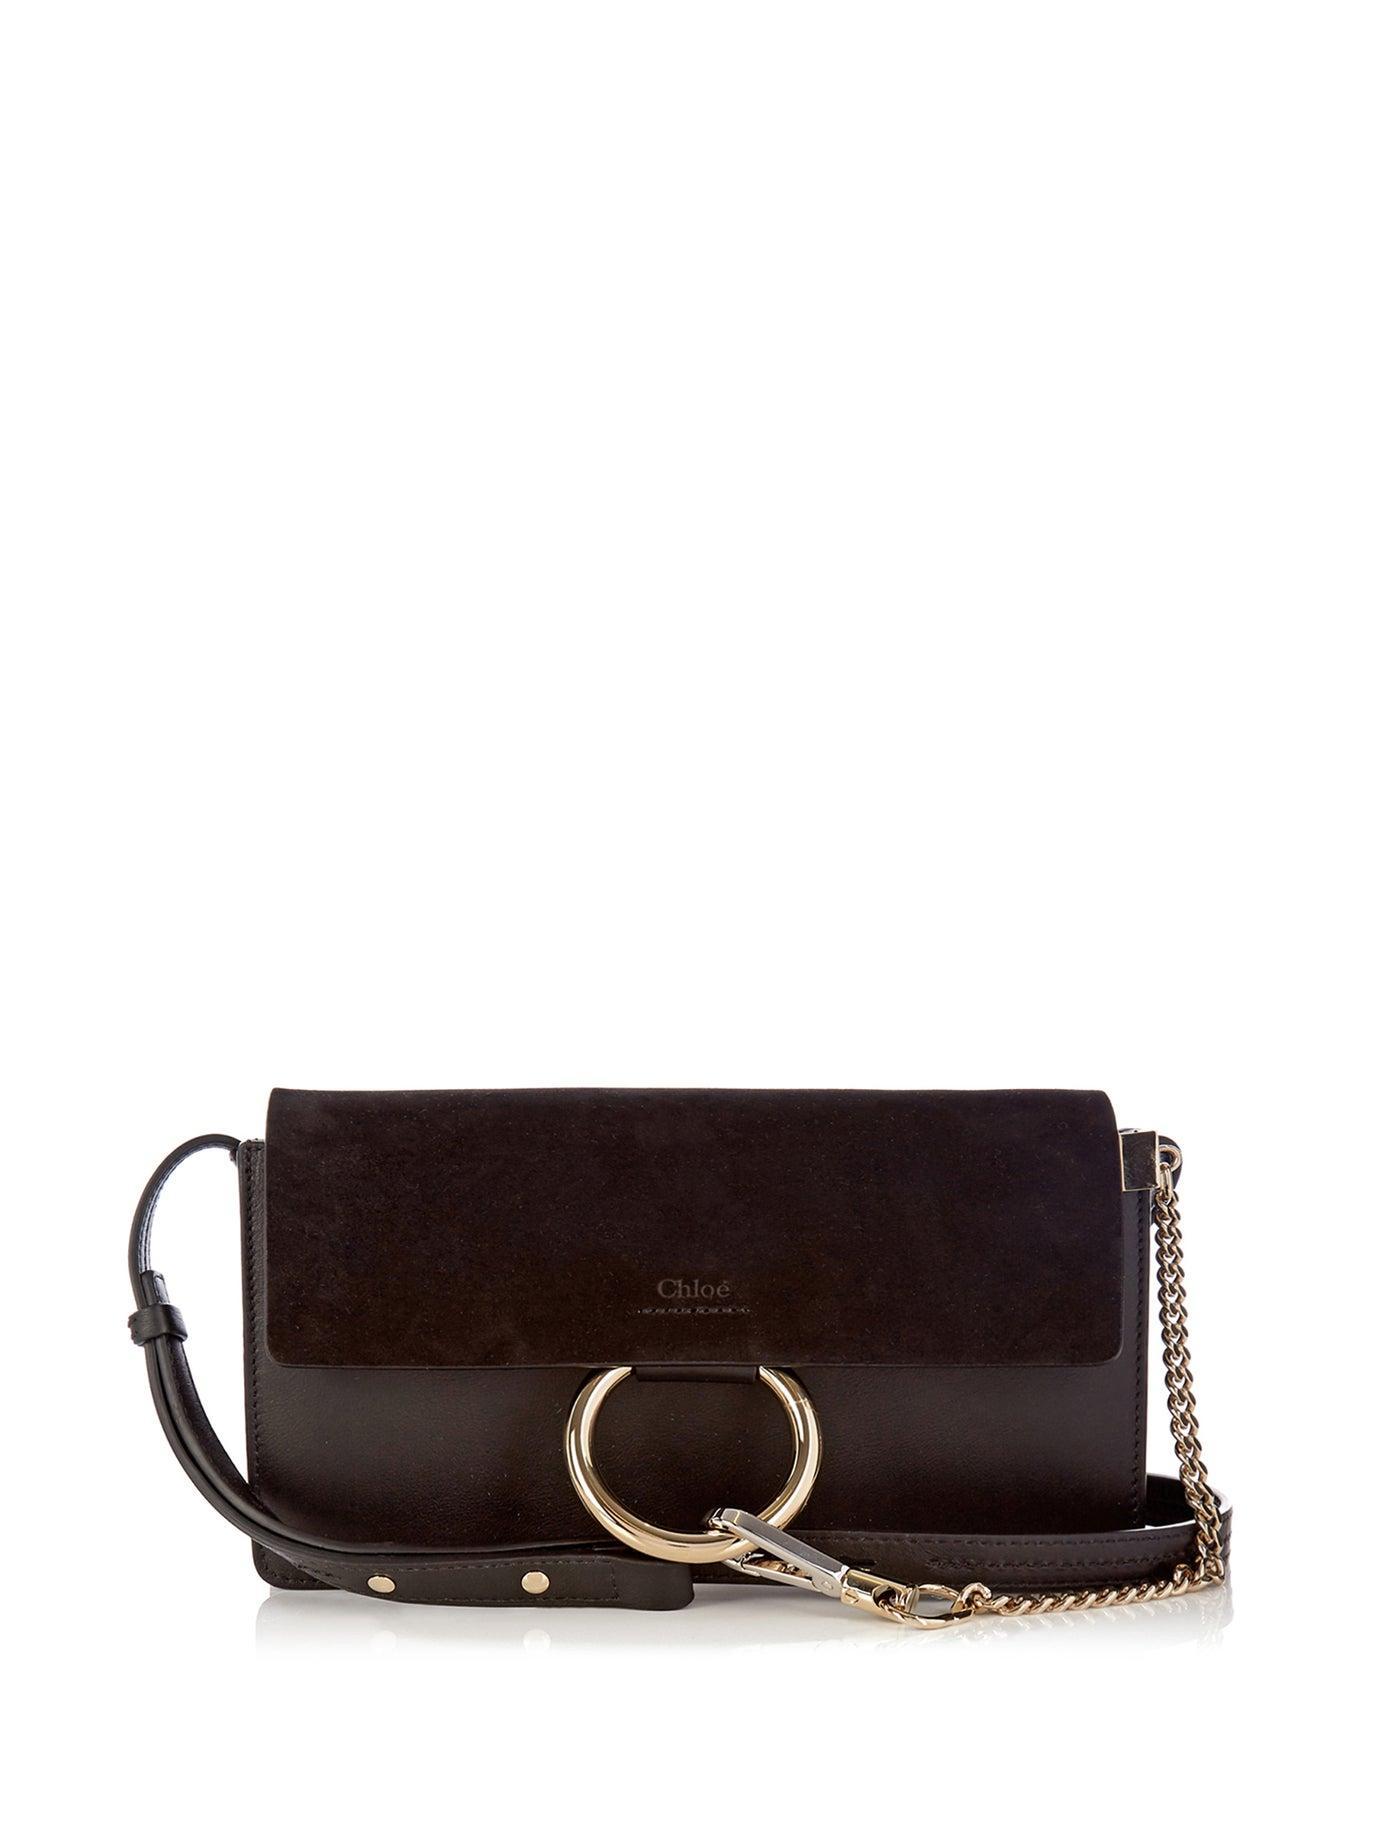 de0c307c8bd87 Chloé Faye Mini Suede Panel Leather Cross Body Bag in Black - Lyst